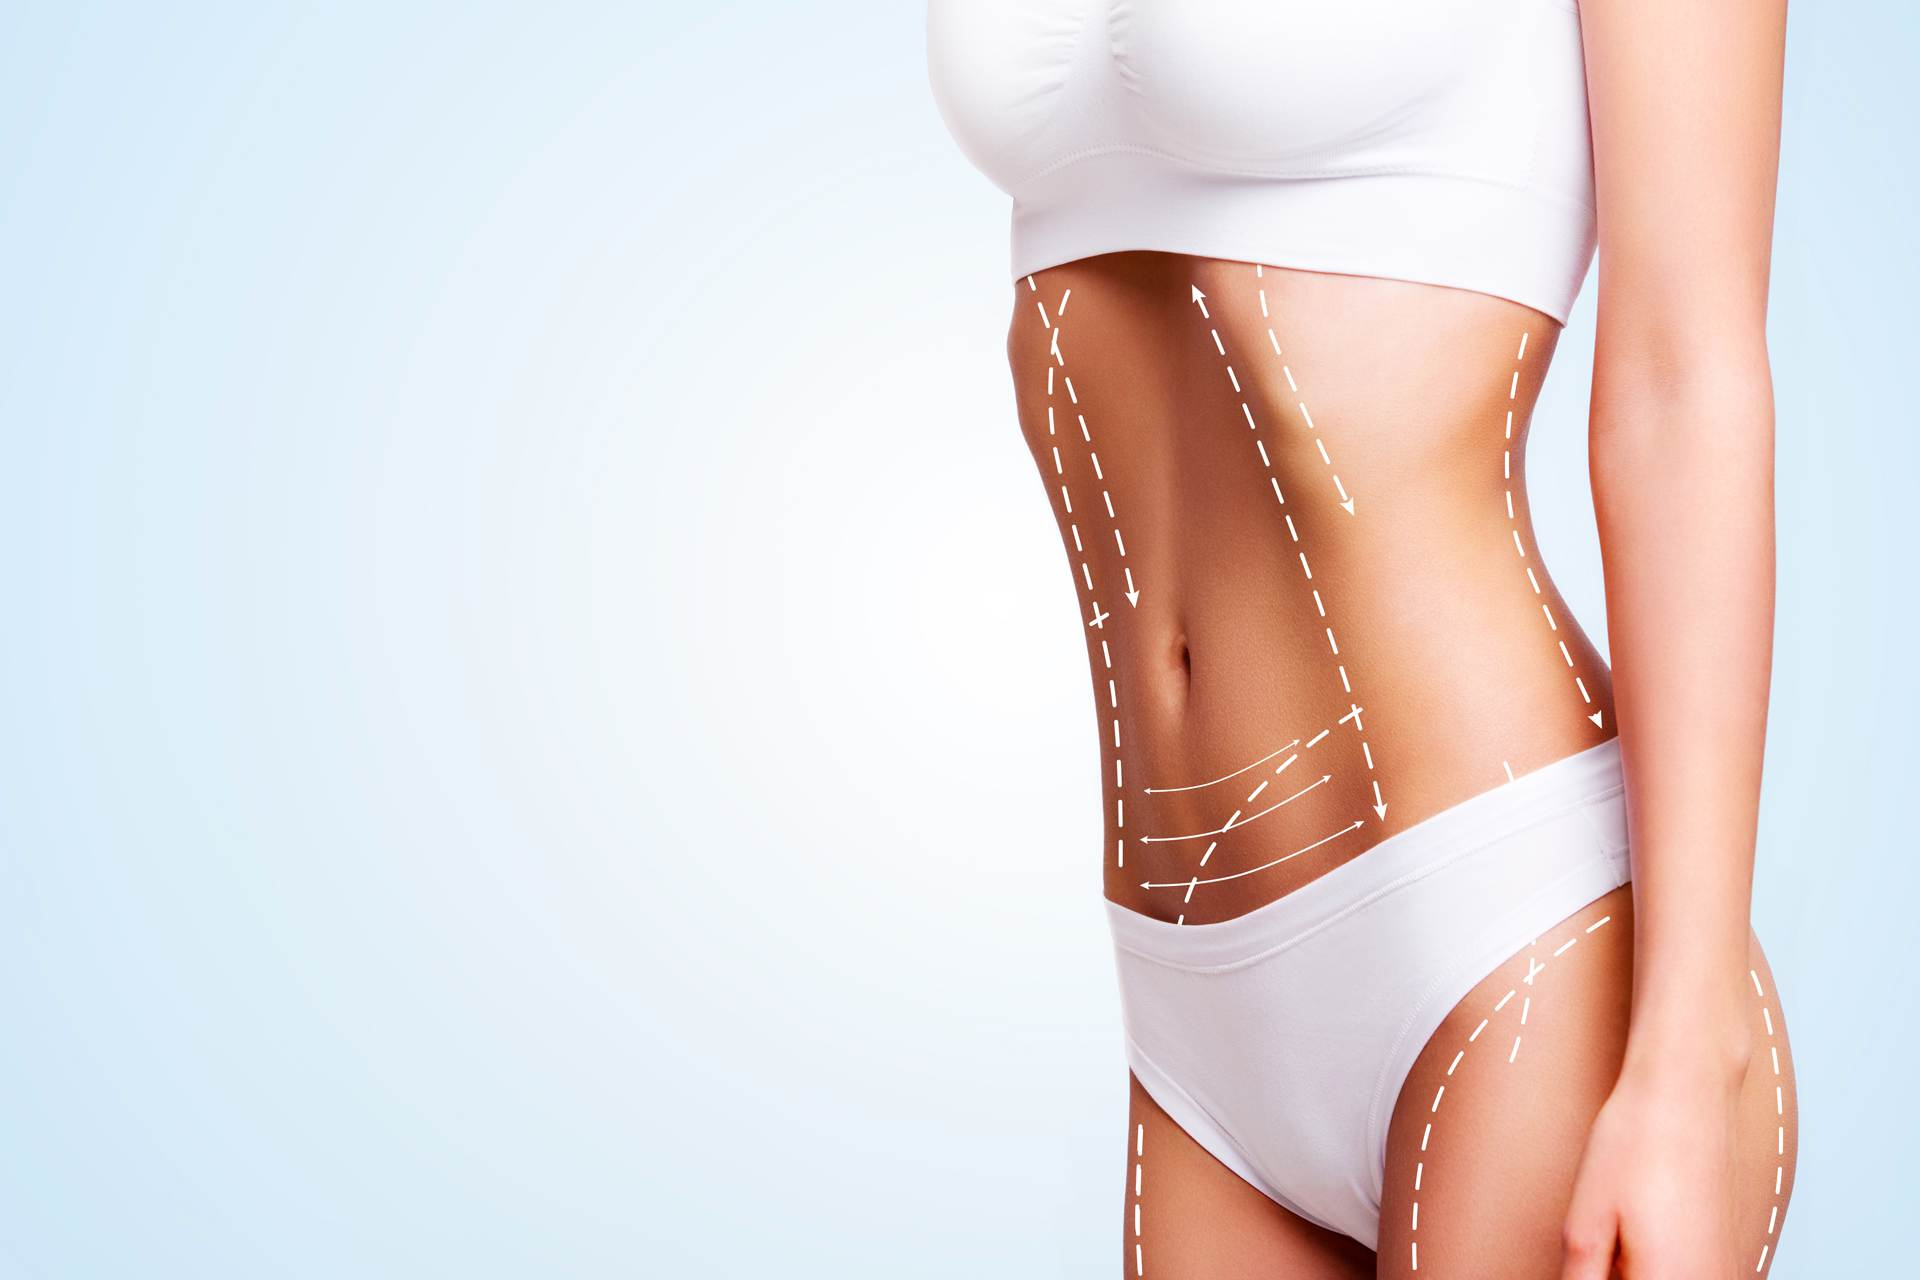 iStock_000007970561Medium-e1388865381474 Vaser Liposuction